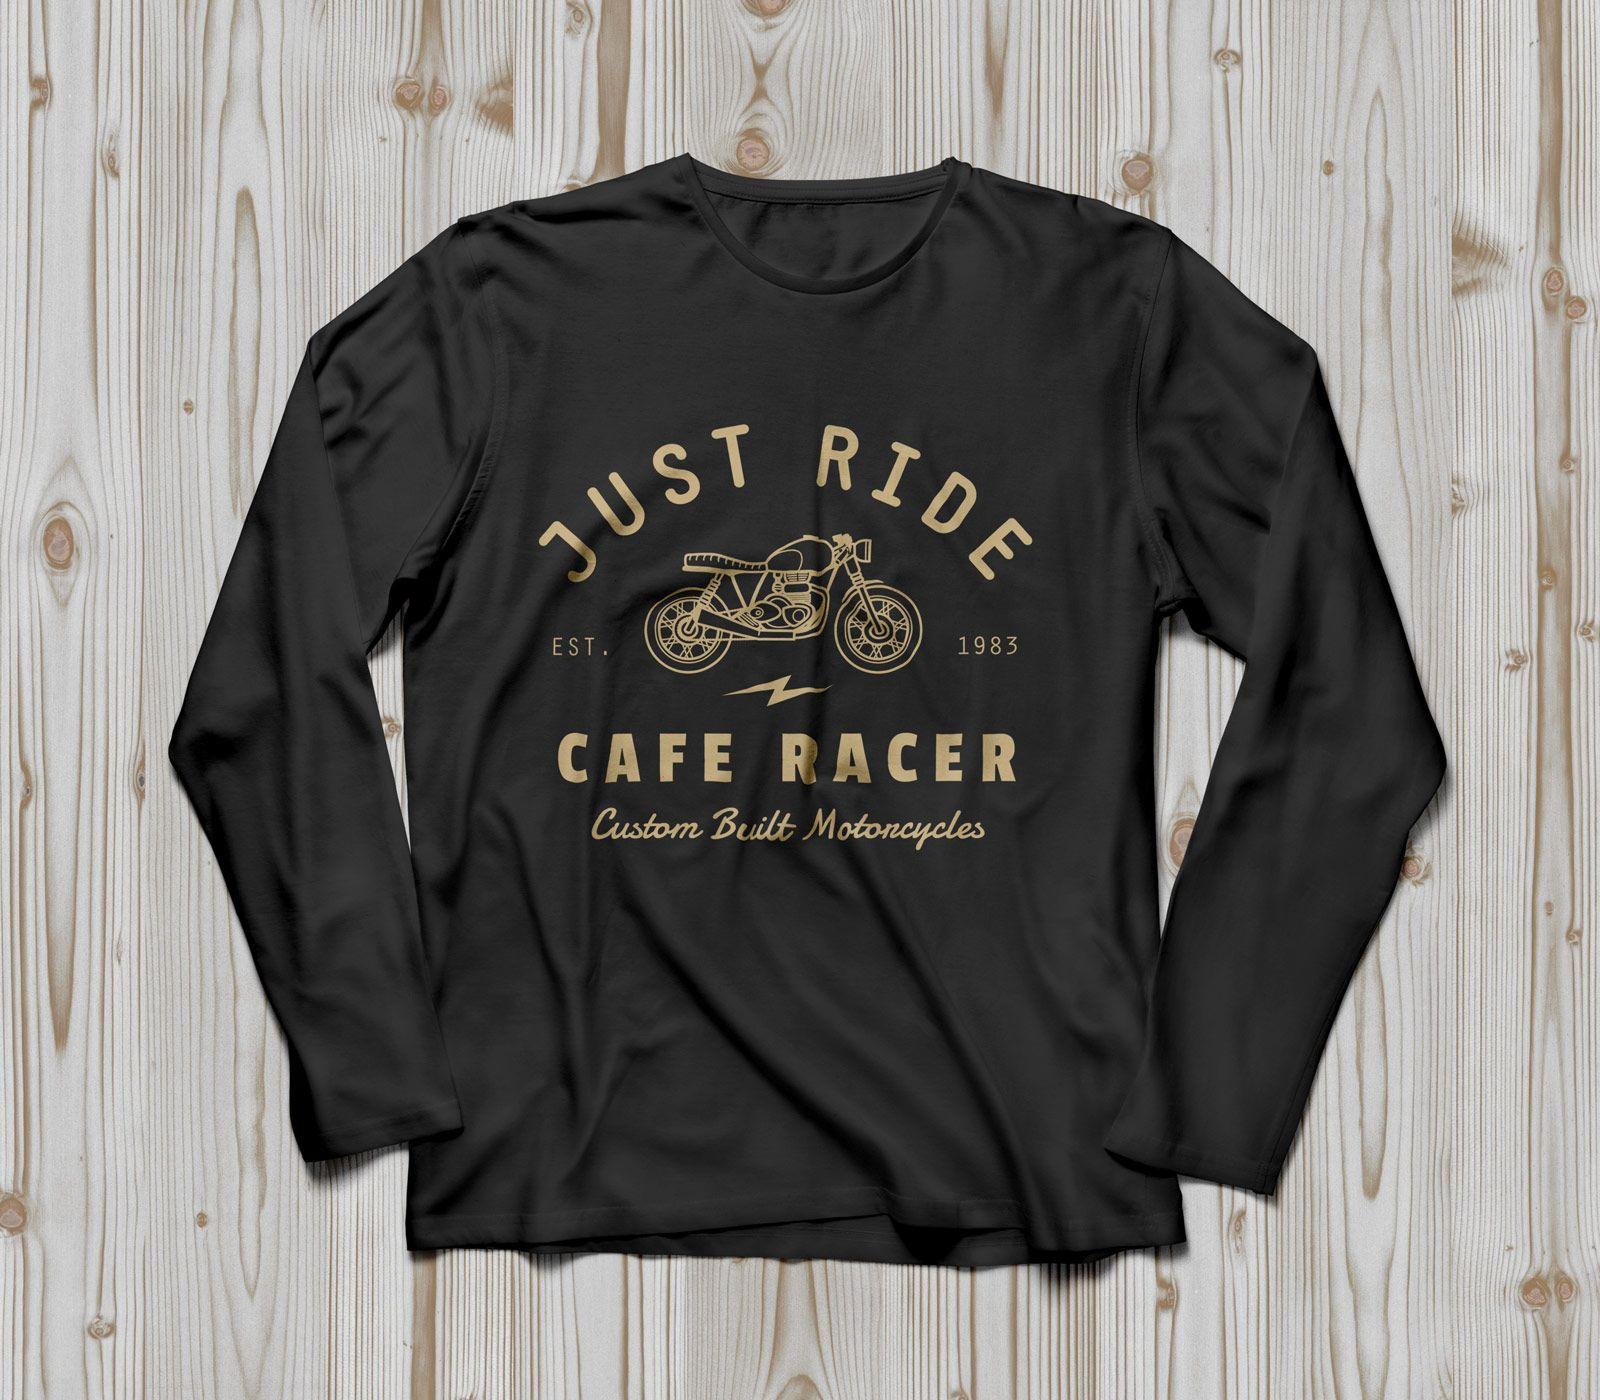 Download Free Full Sleeves T Shirt Mockup Psd T Shirt Design Template Shirt Mockup Full Sleeve Tshirt